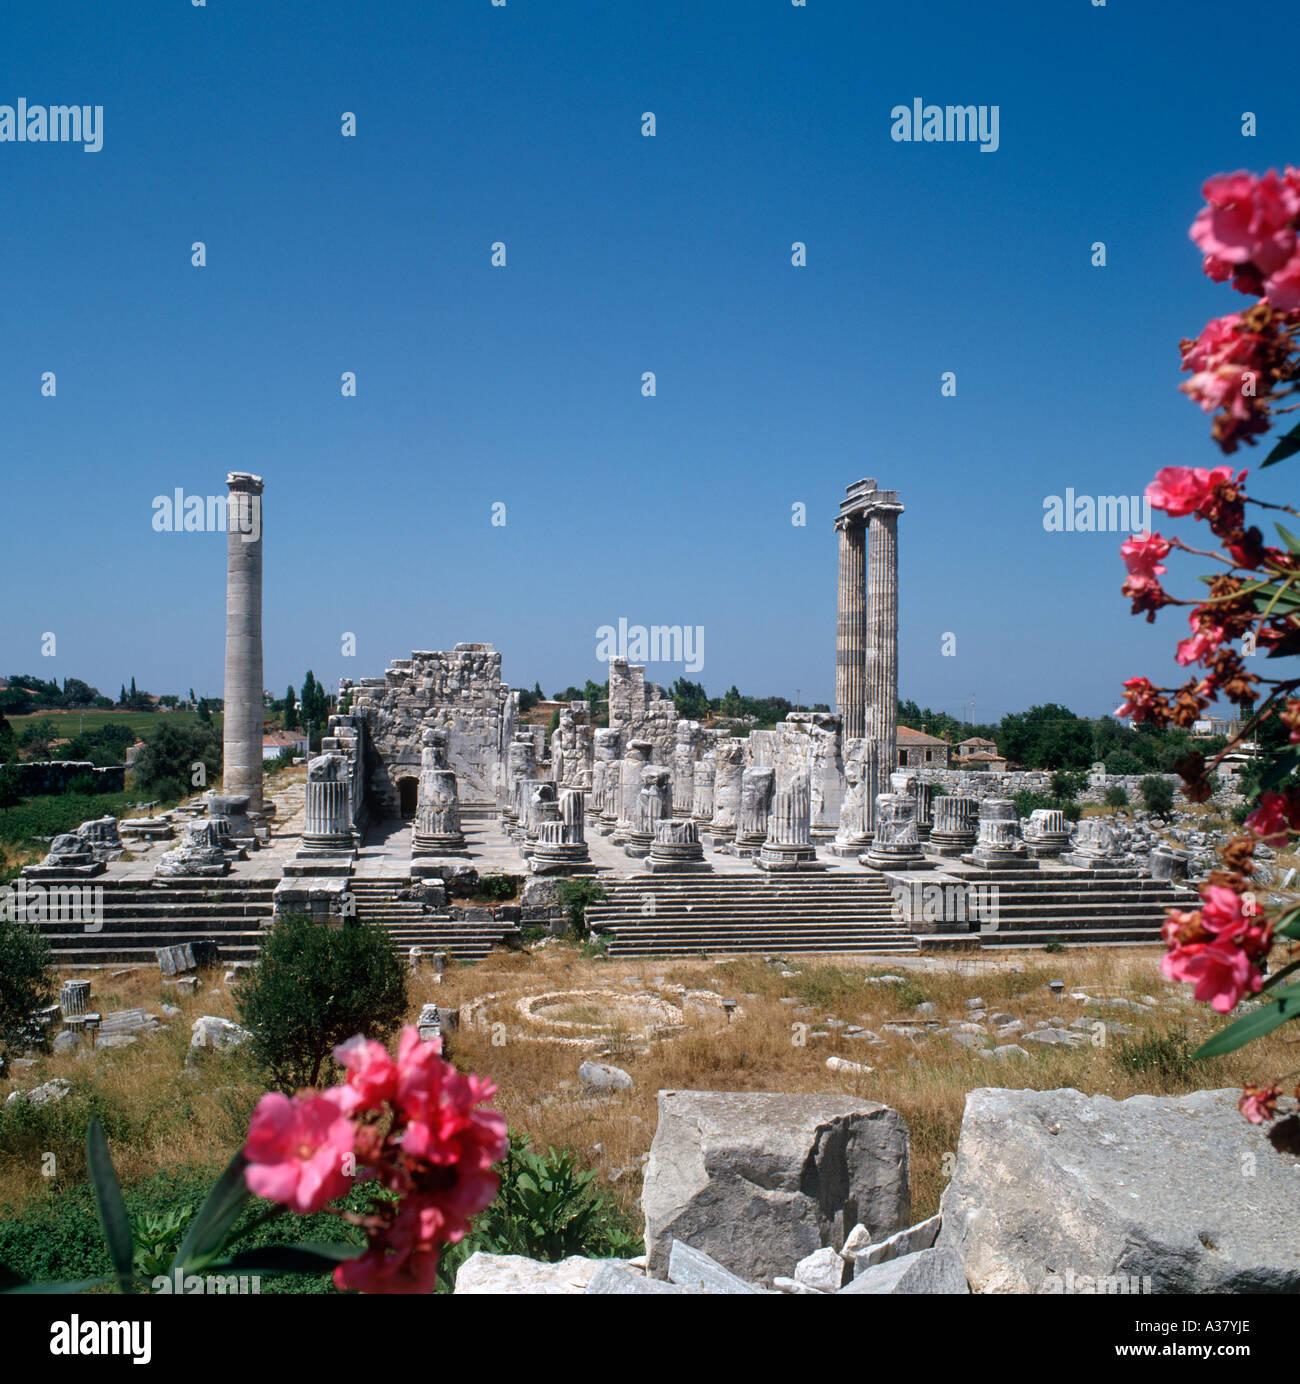 Temple of Apollo, Didim, Altinkum, Turkey - Stock Image